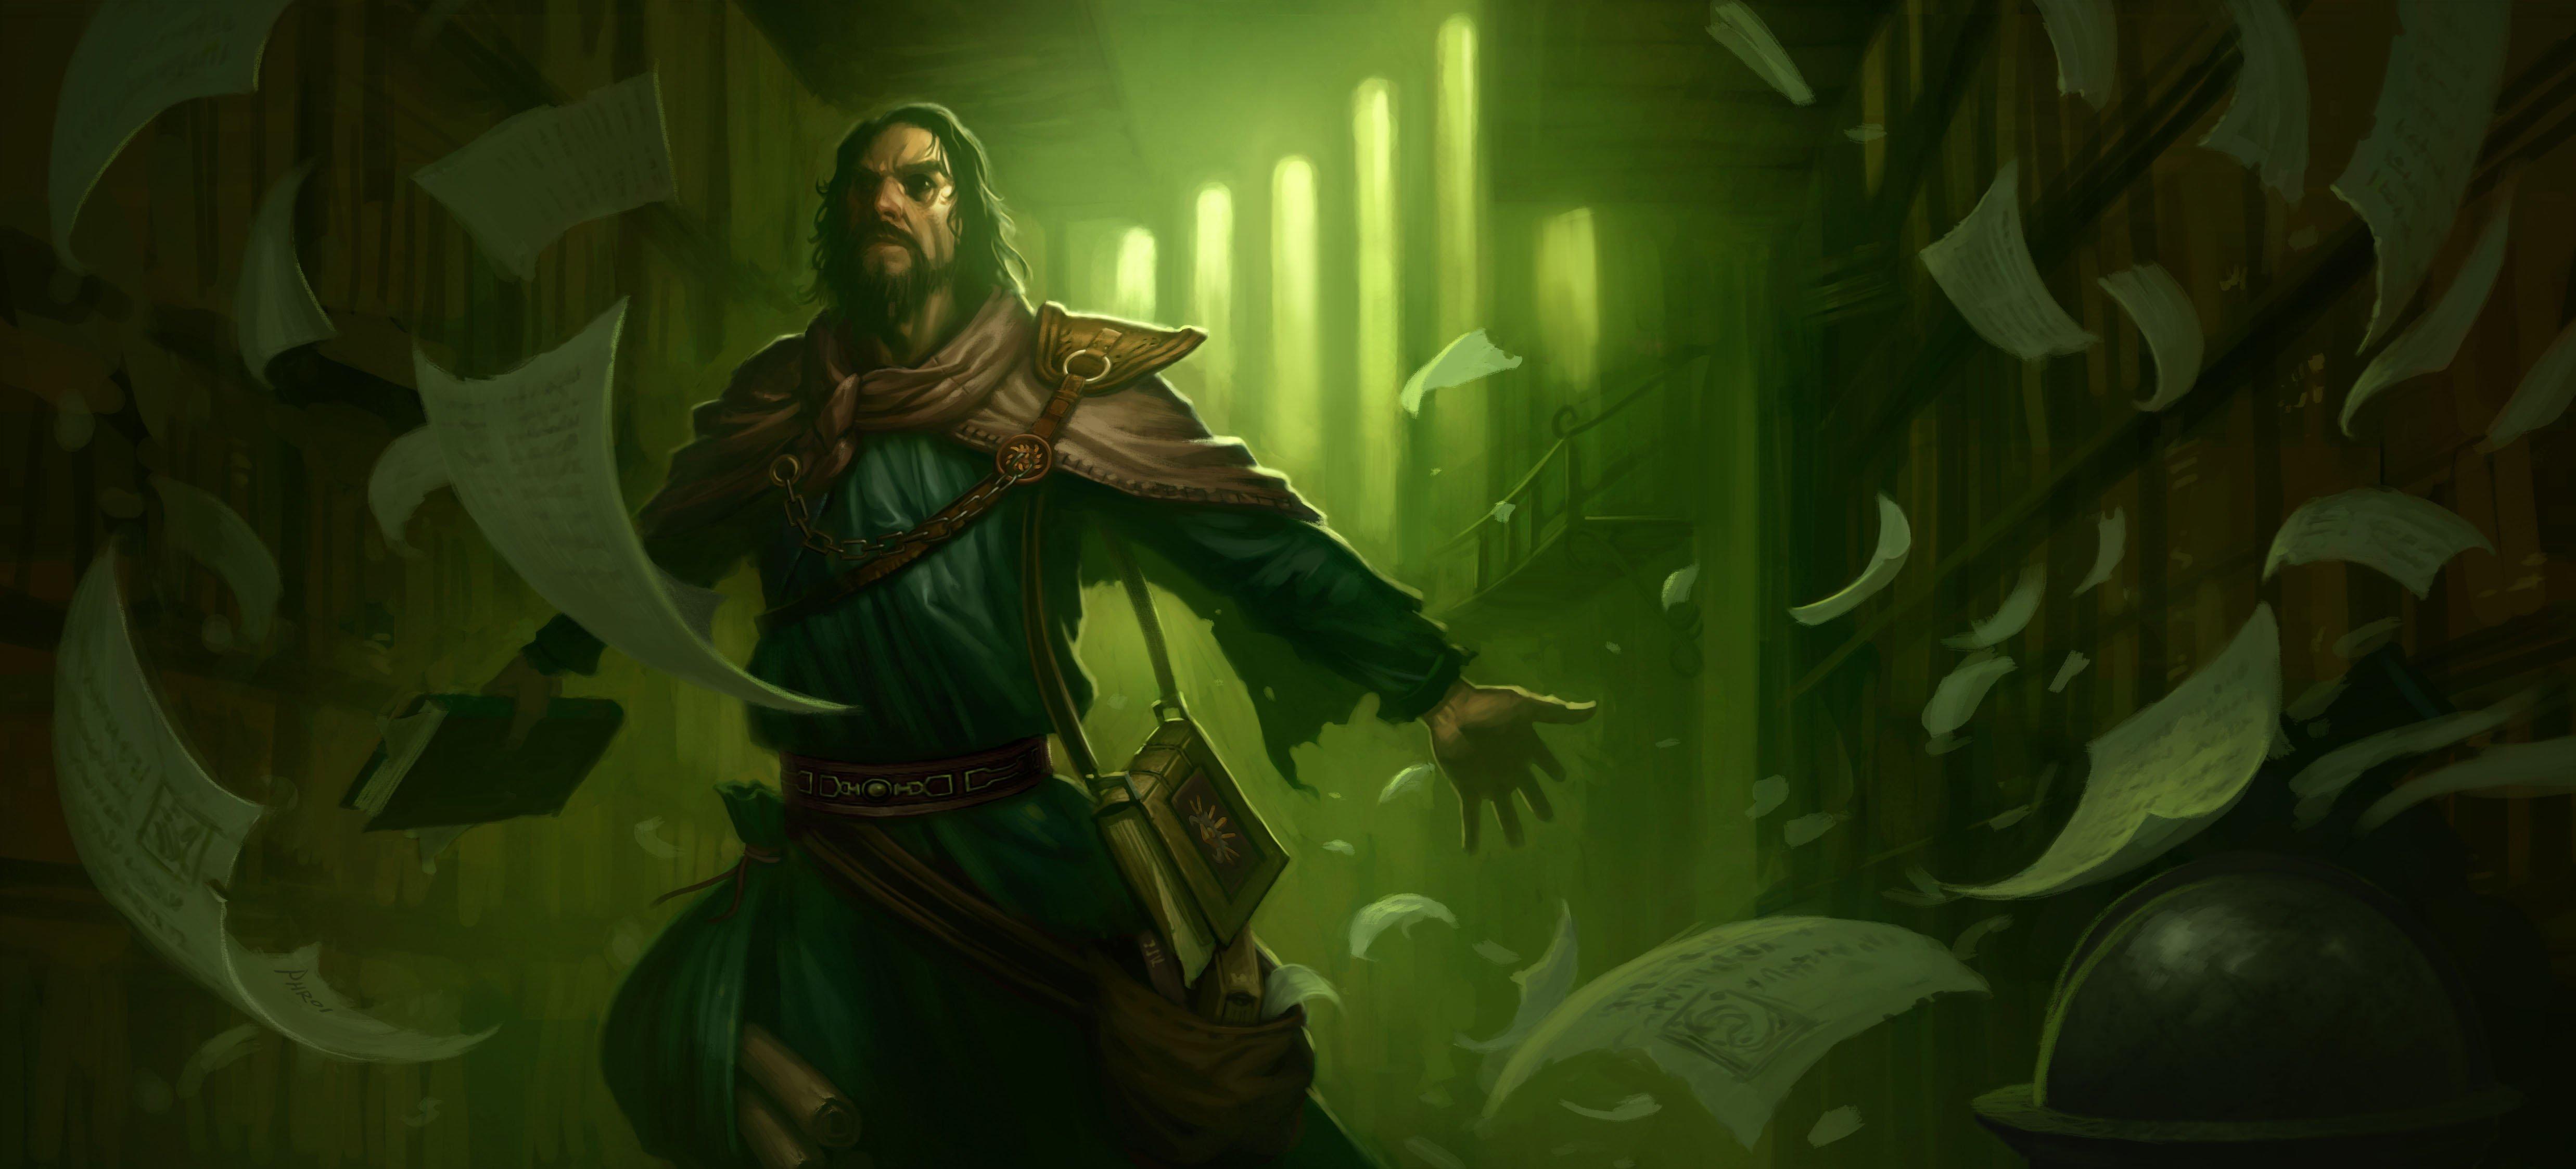 New Diablo III Class Revealed: The Archivist #6908